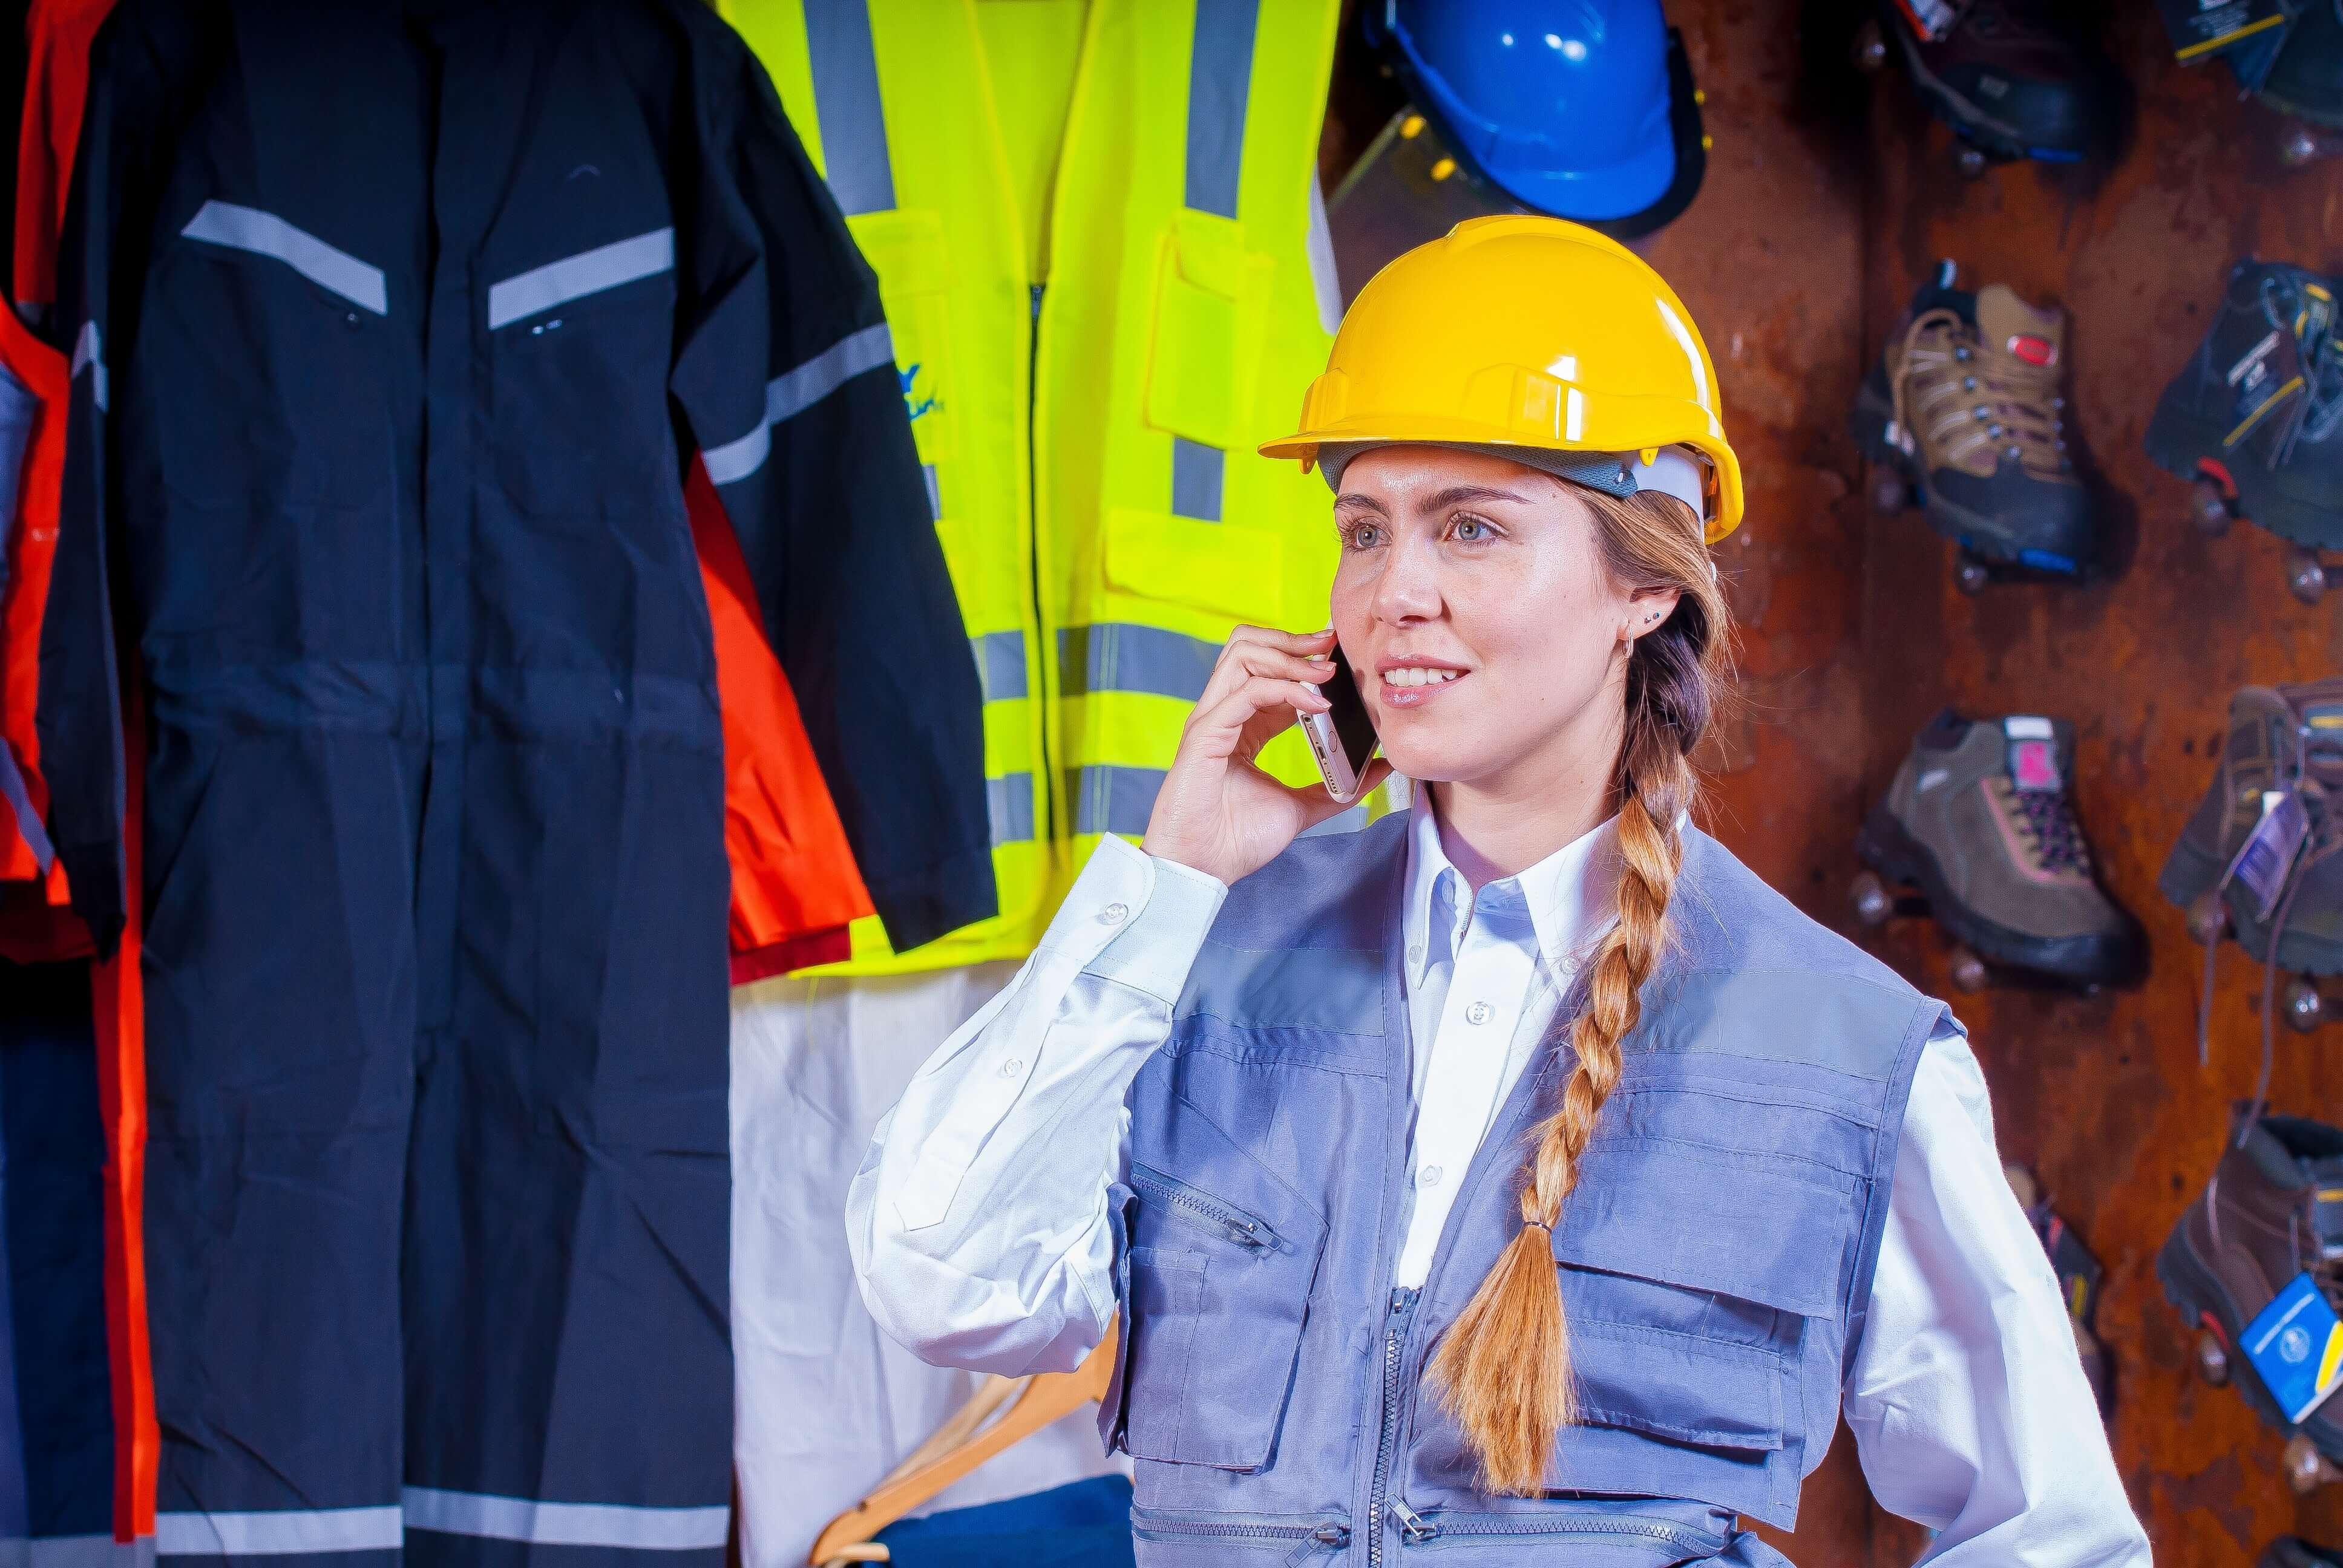 Trabajadora del sector metal